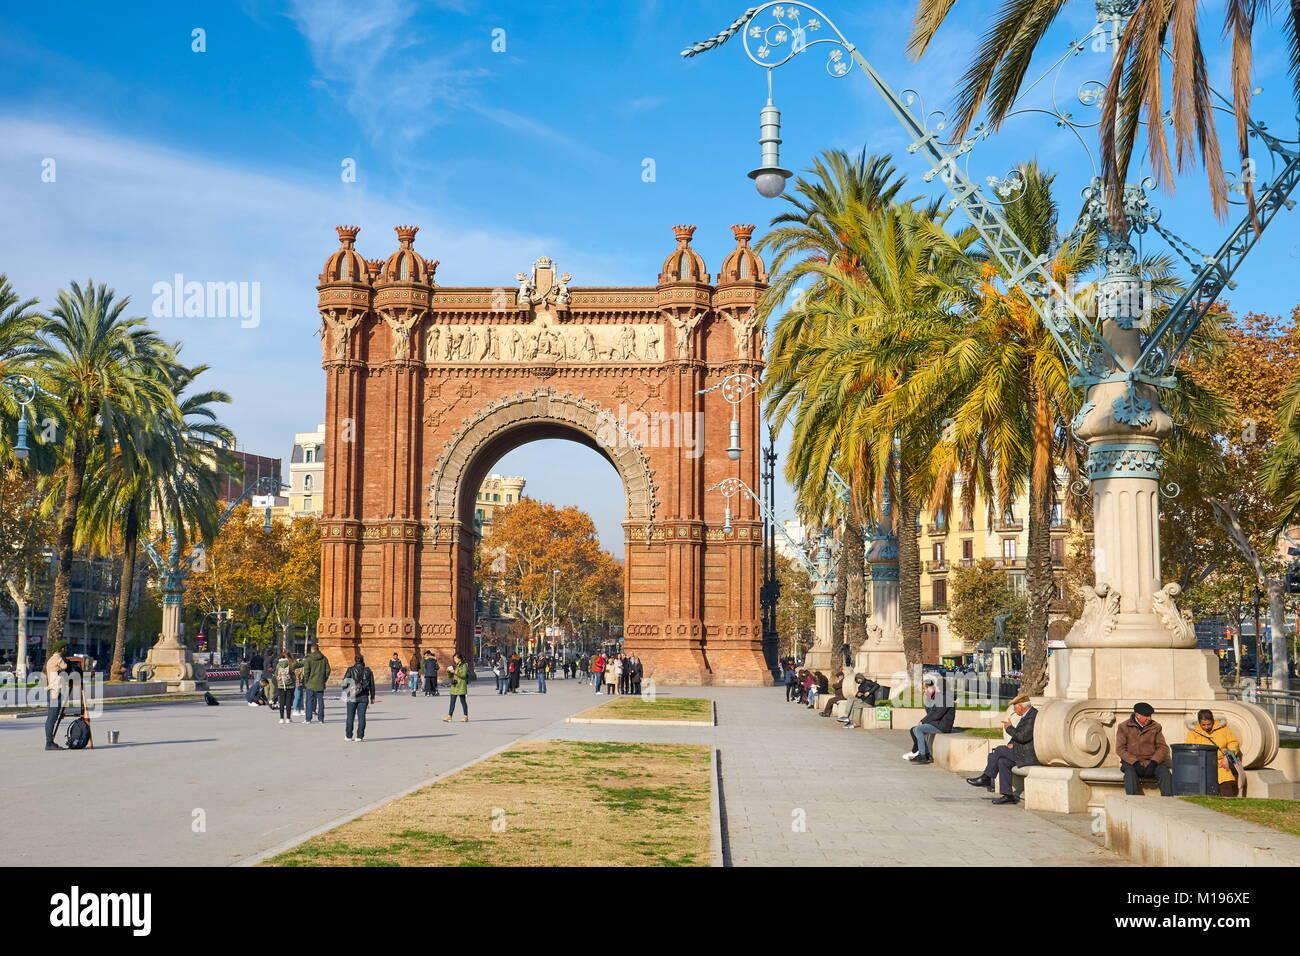 Arc de Triomf ou Arco de Triunfo, Barcelone, Catalogne, Espagne Photo Stock